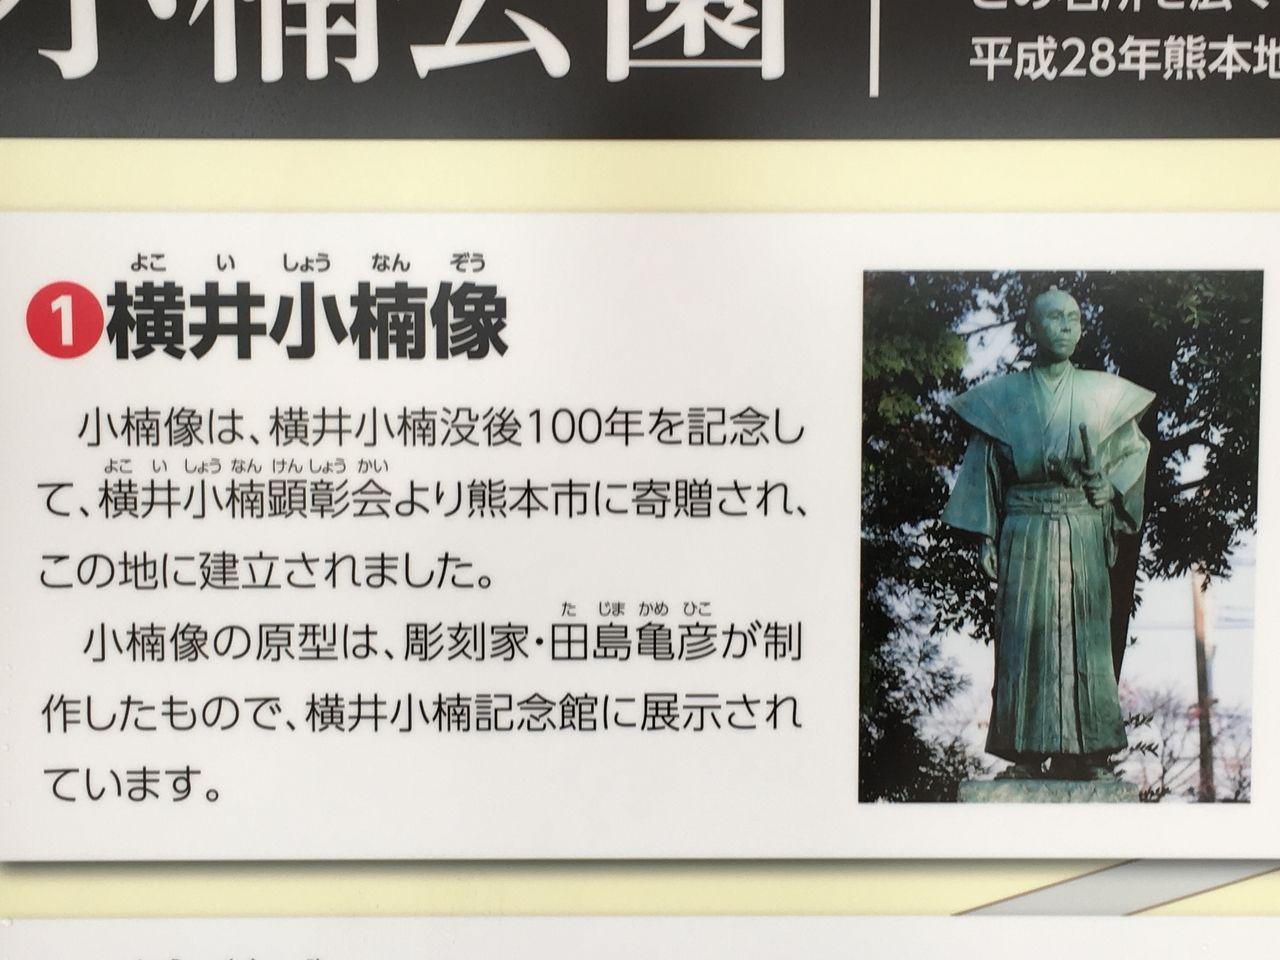 小楠先生像の説明